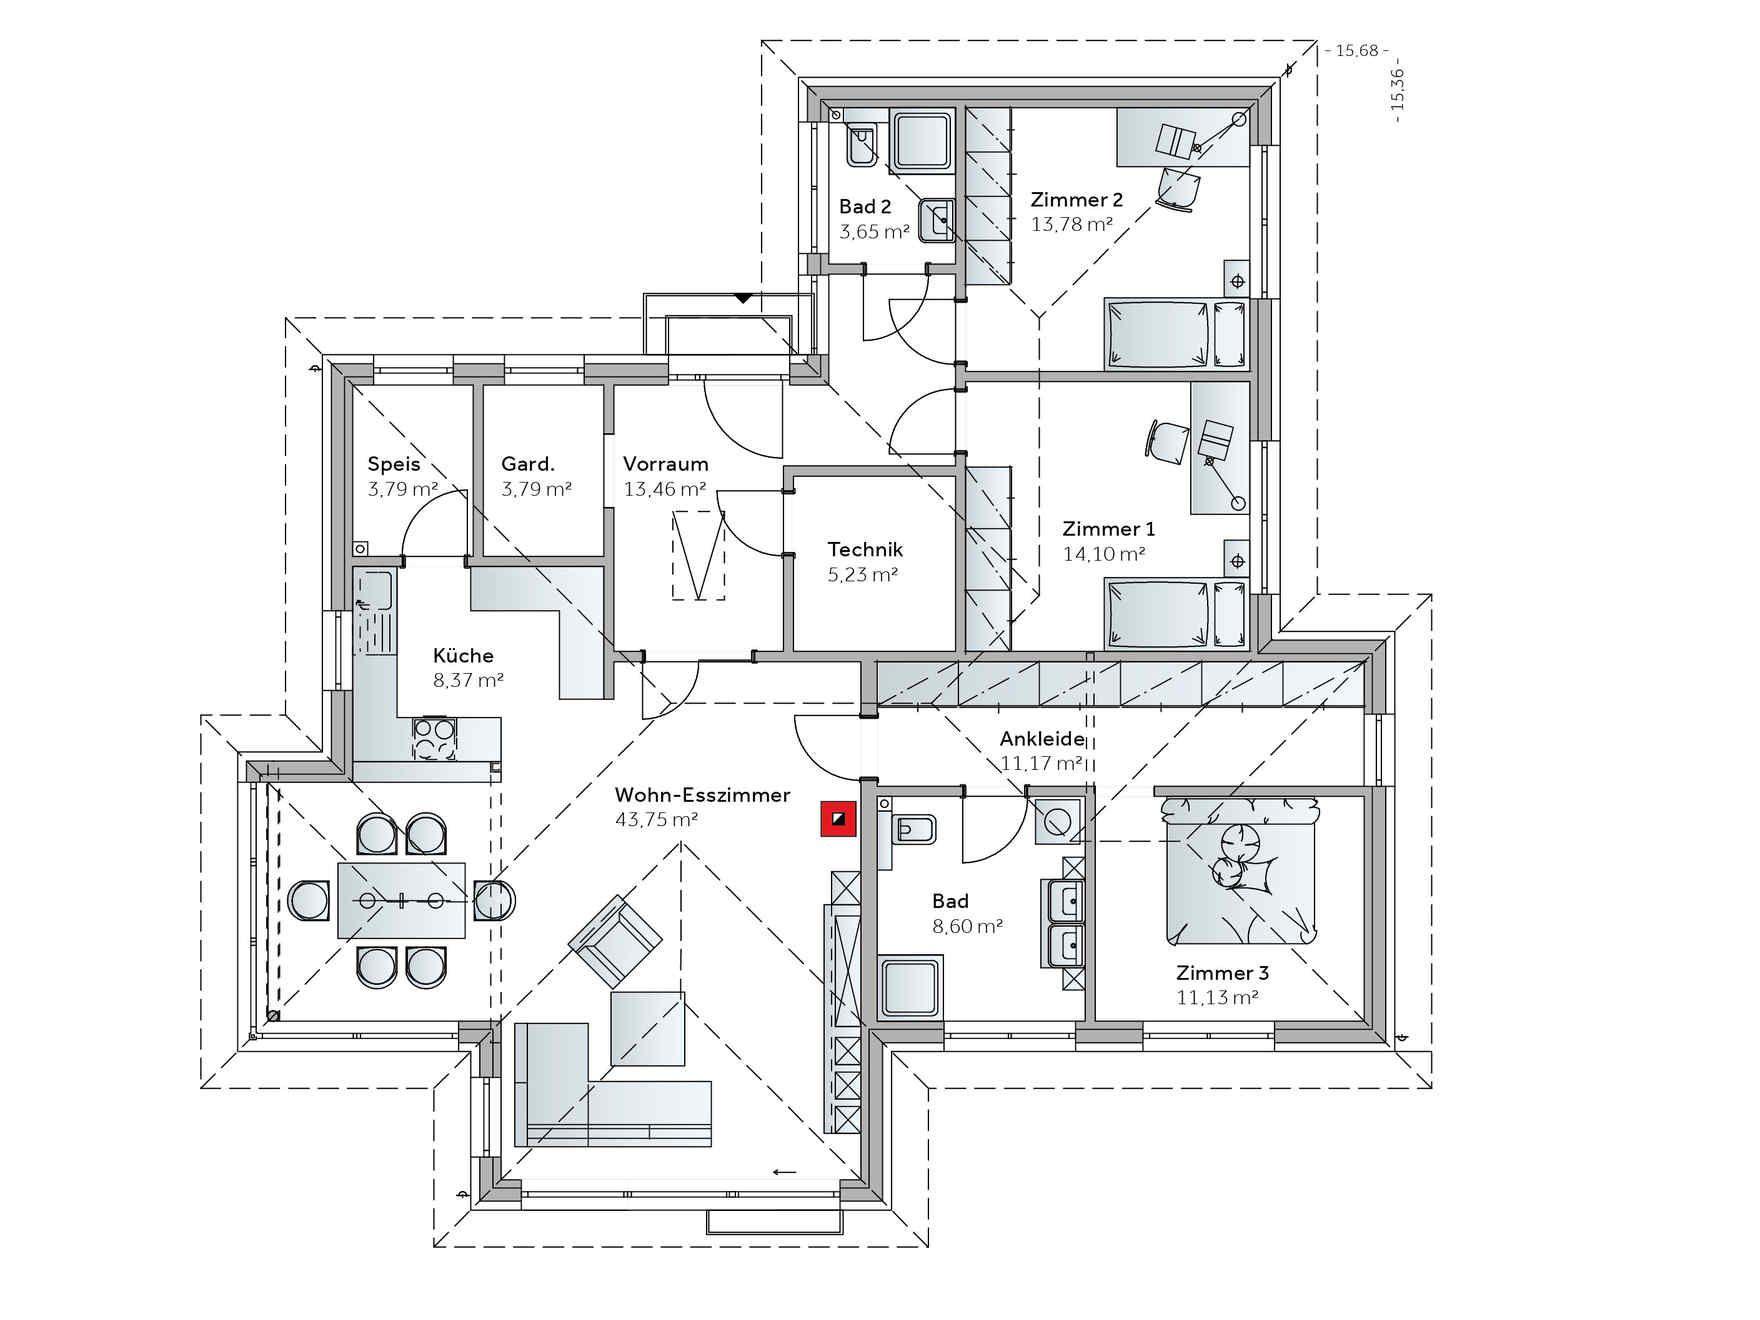 Fertighaus Bungalow S141 Fertighaus bungalow, Haus bungalow